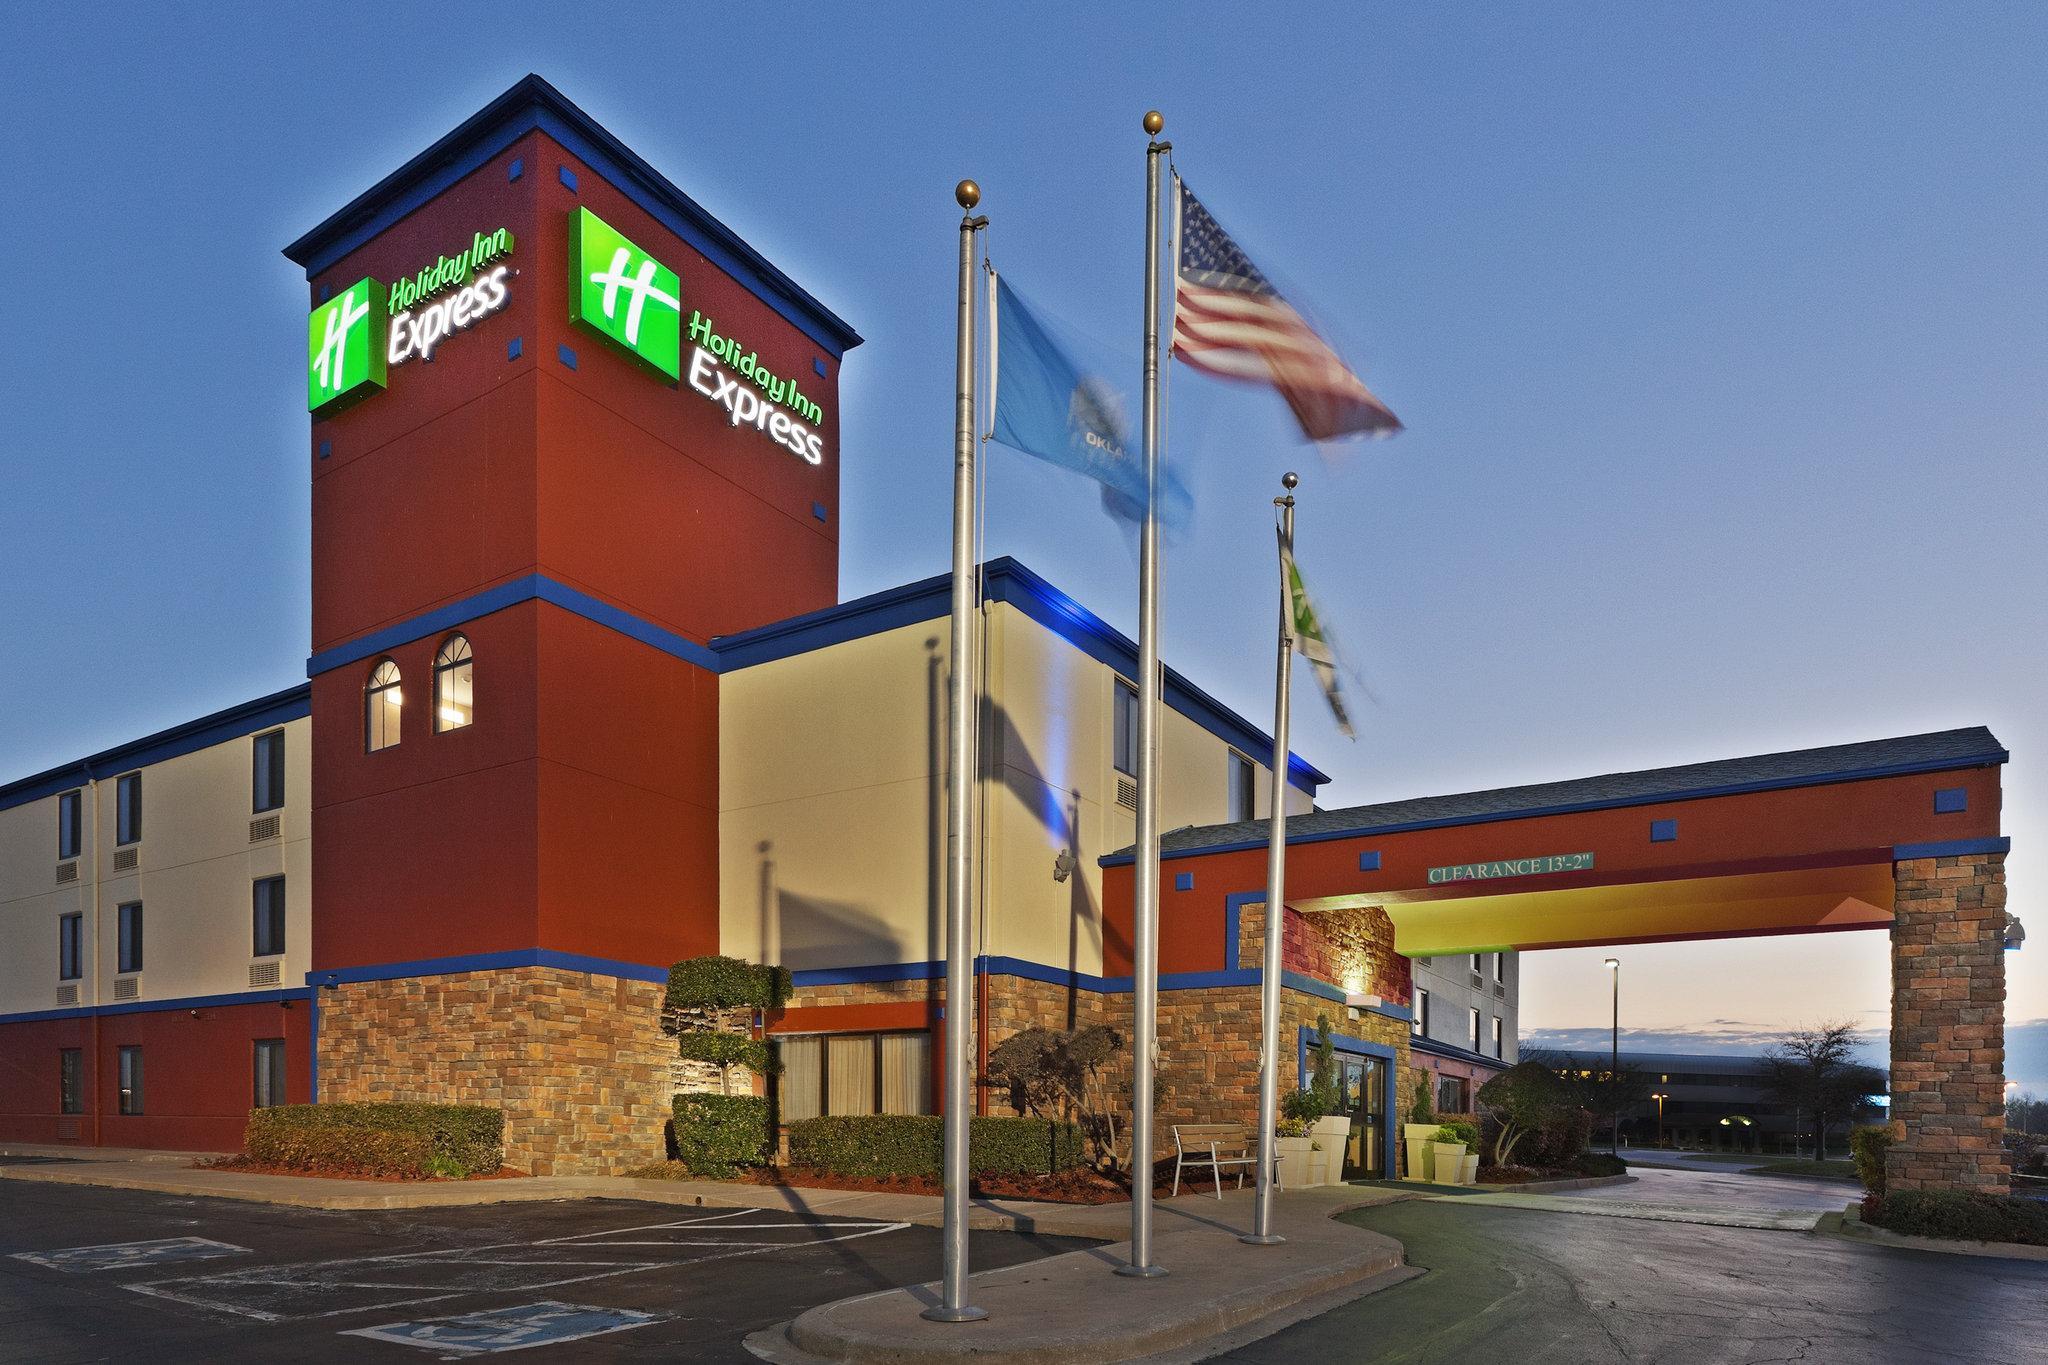 Holiday Inn Express Central